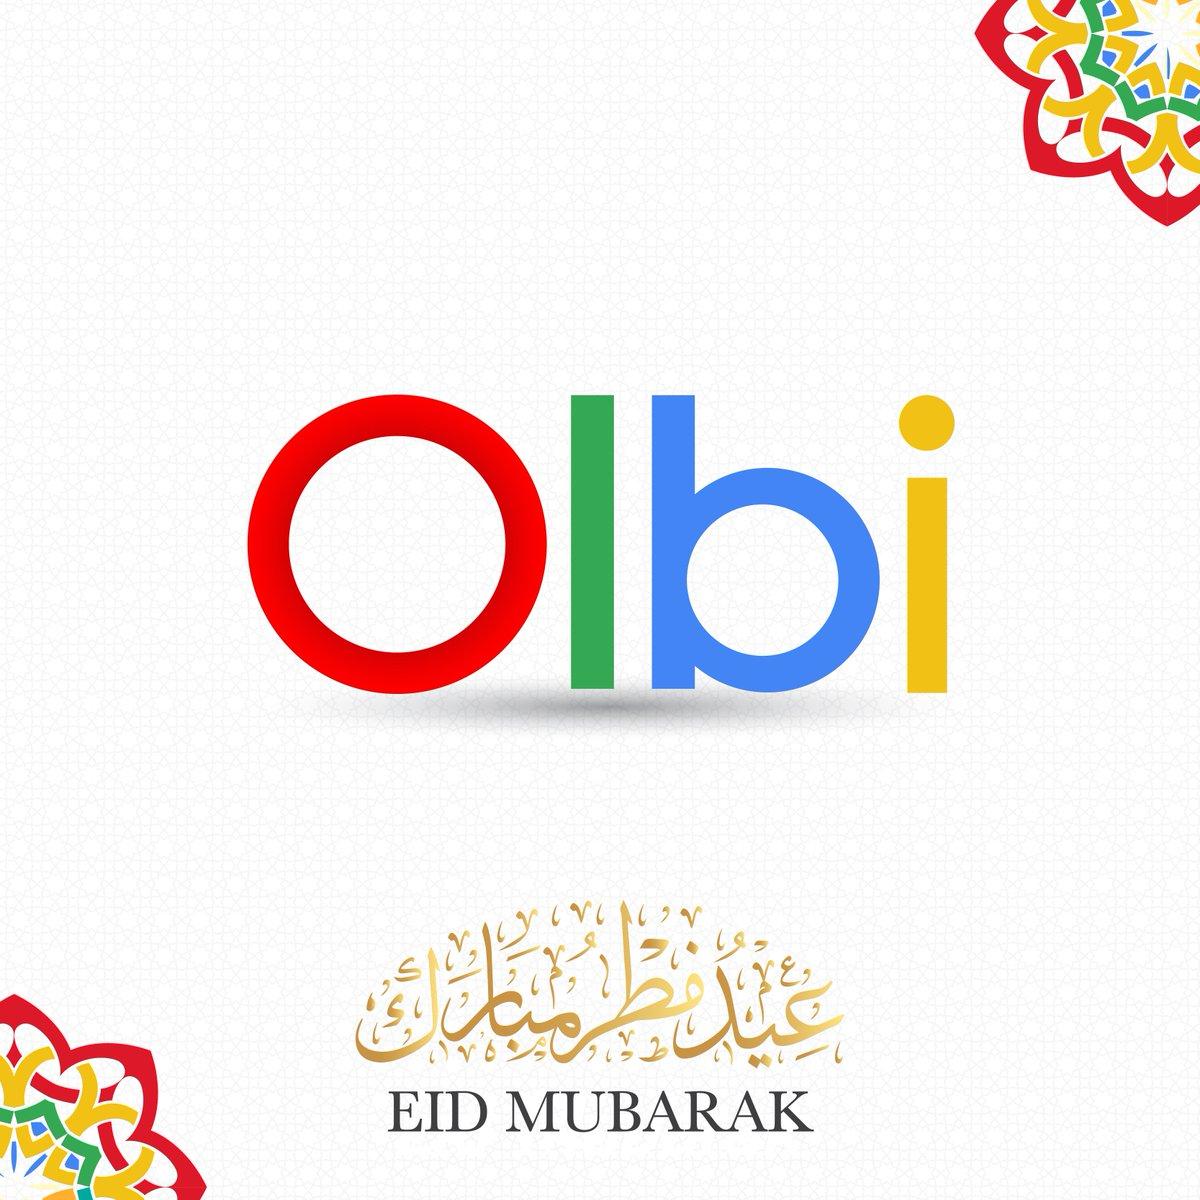 Happy Eid!! كل عيد و انتم بخير!  #Olbi #OlbiLebanon #OnlineBusinessInformation #Greetings #دليل #وظائف #Business #Directory #Restaurants #Hotels #Spa #JobsLebanon #Recruitment #News #BusinessNews #Deals #Offers #Fitr #ramadan #eid #eidmubarak https://t.co/cyvmceR00L